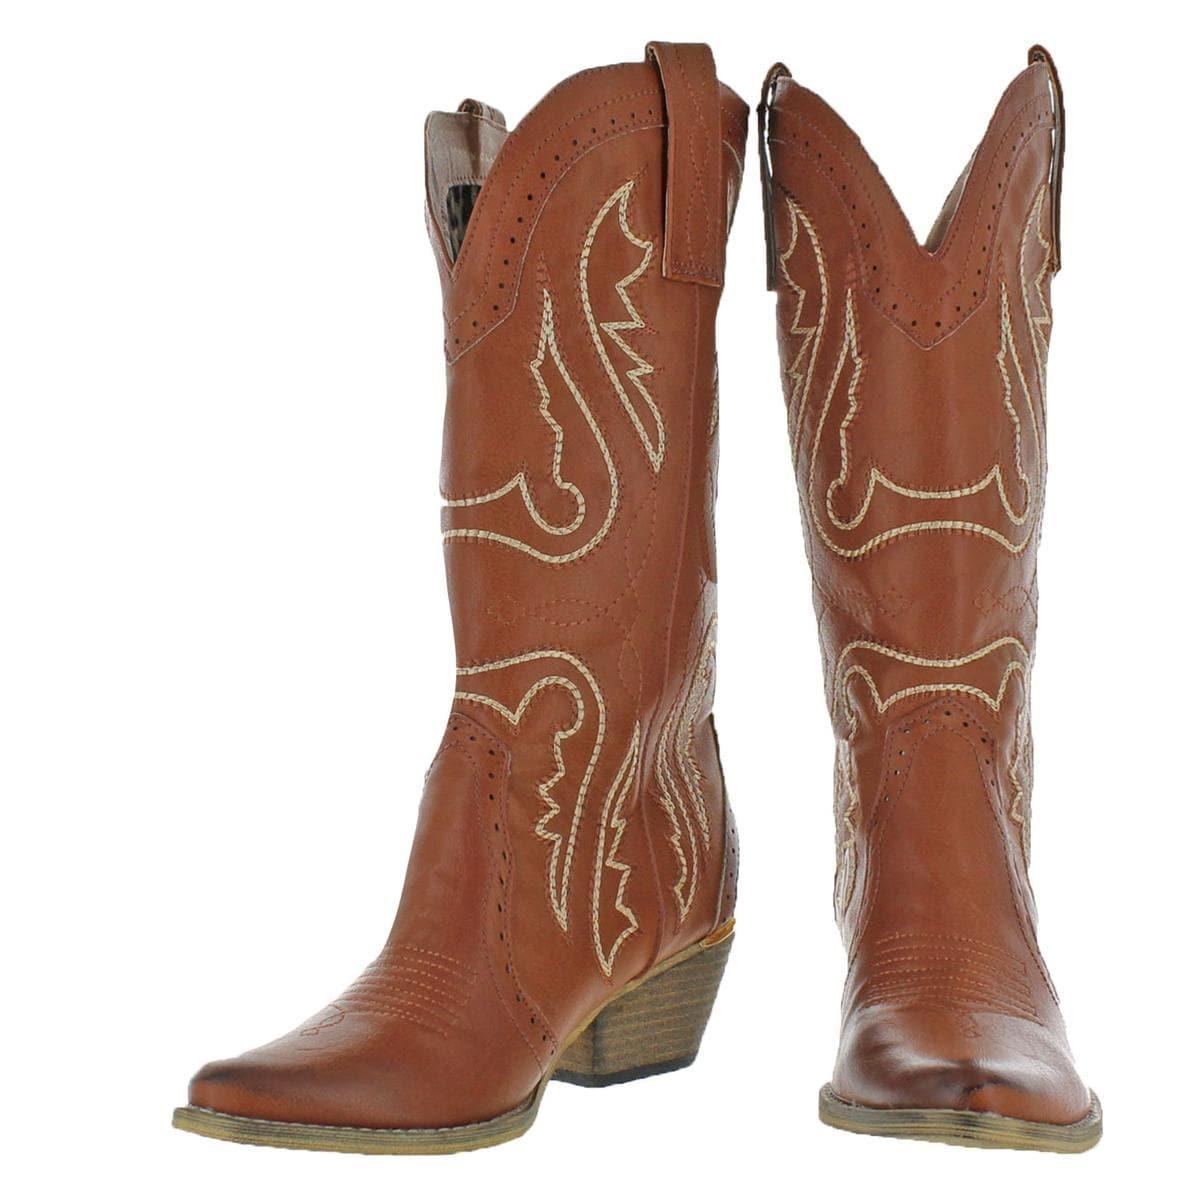 23c074bcbea Very Volatile Womens Raspy Cowboy, Western Boots Mid Calf Pull On